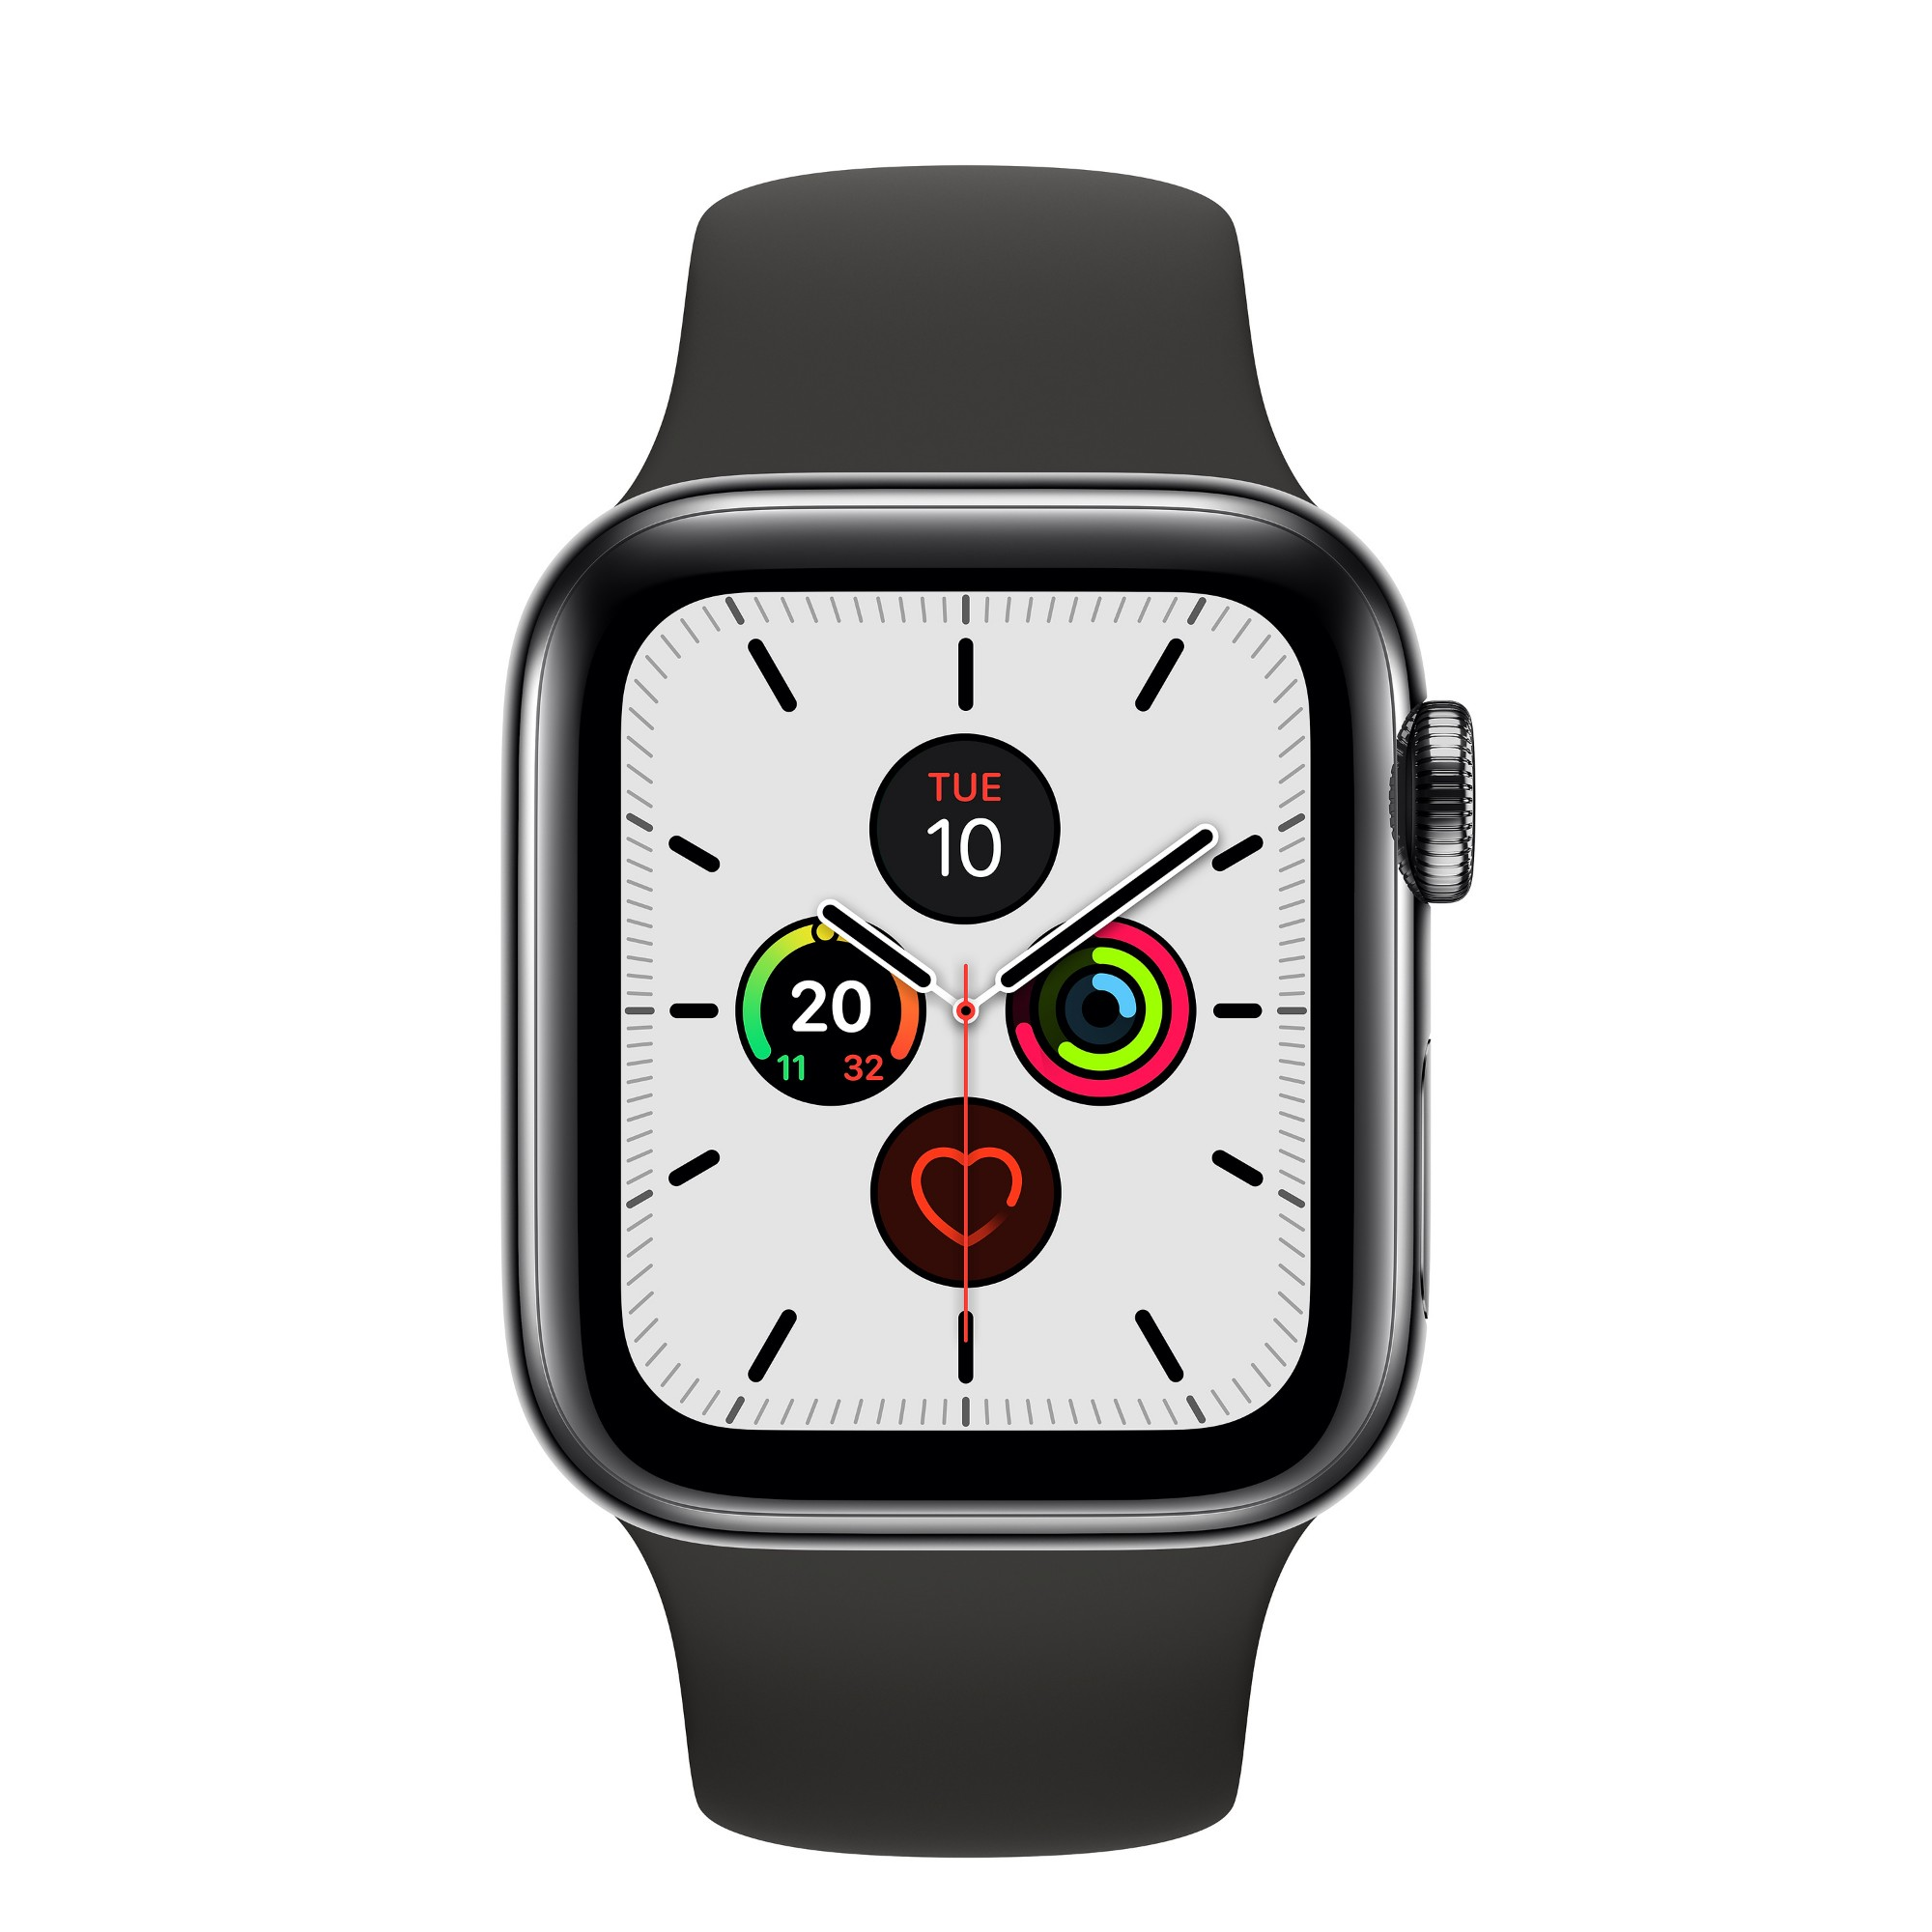 Apple Watch Series 5 smartwatch Black OLED Cellular GPS satellite